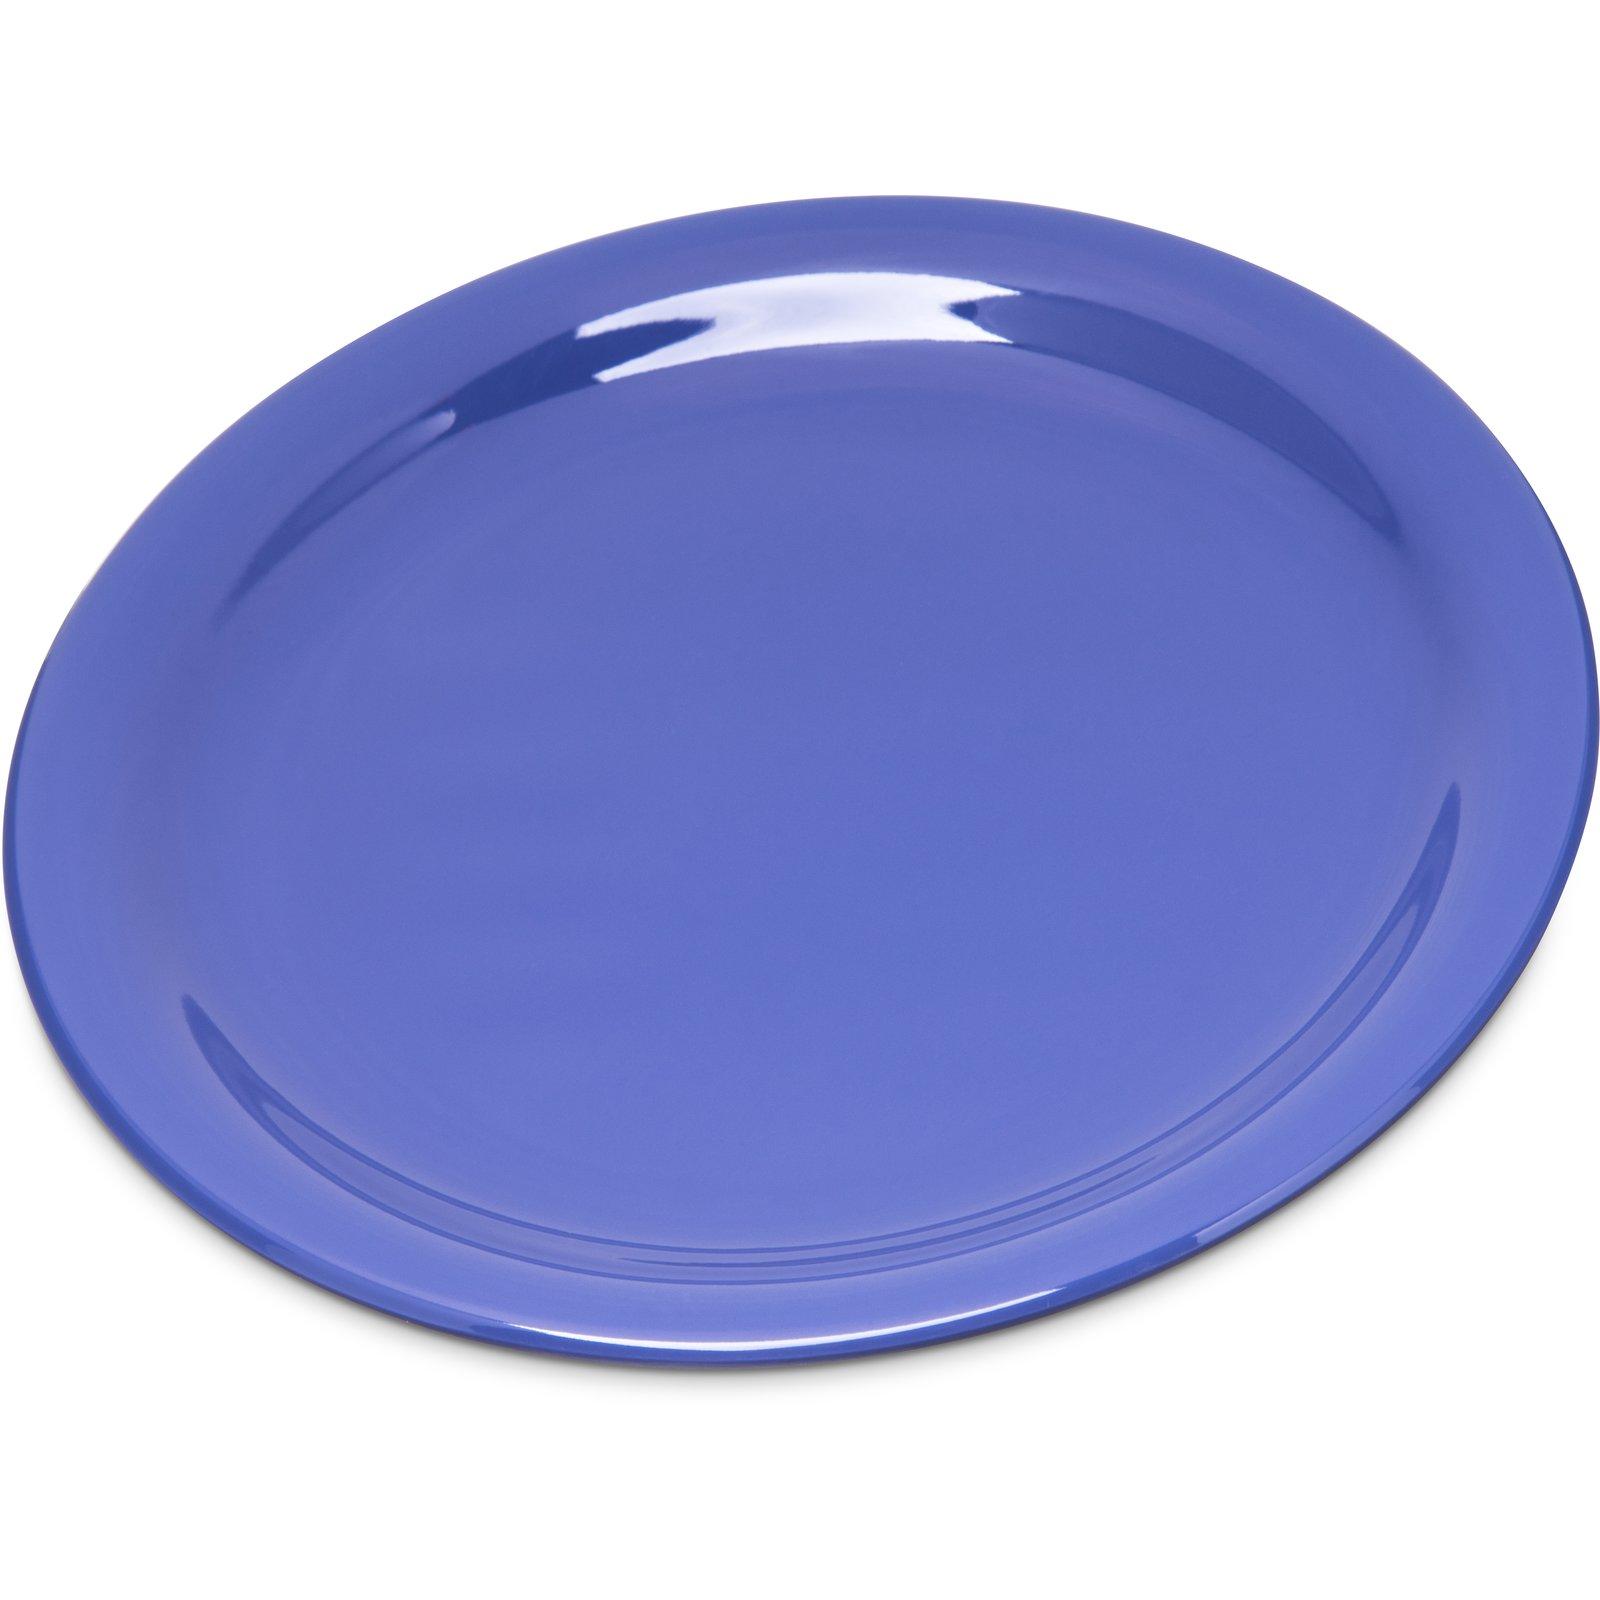 4300614 - Durus® Melamine Salad Plate Narrow Rim 7.25  - Ocean Blue  sc 1 st  Carlisle FoodService Products & 4300614 - Durus® Melamine Salad Plate Narrow Rim 7.25